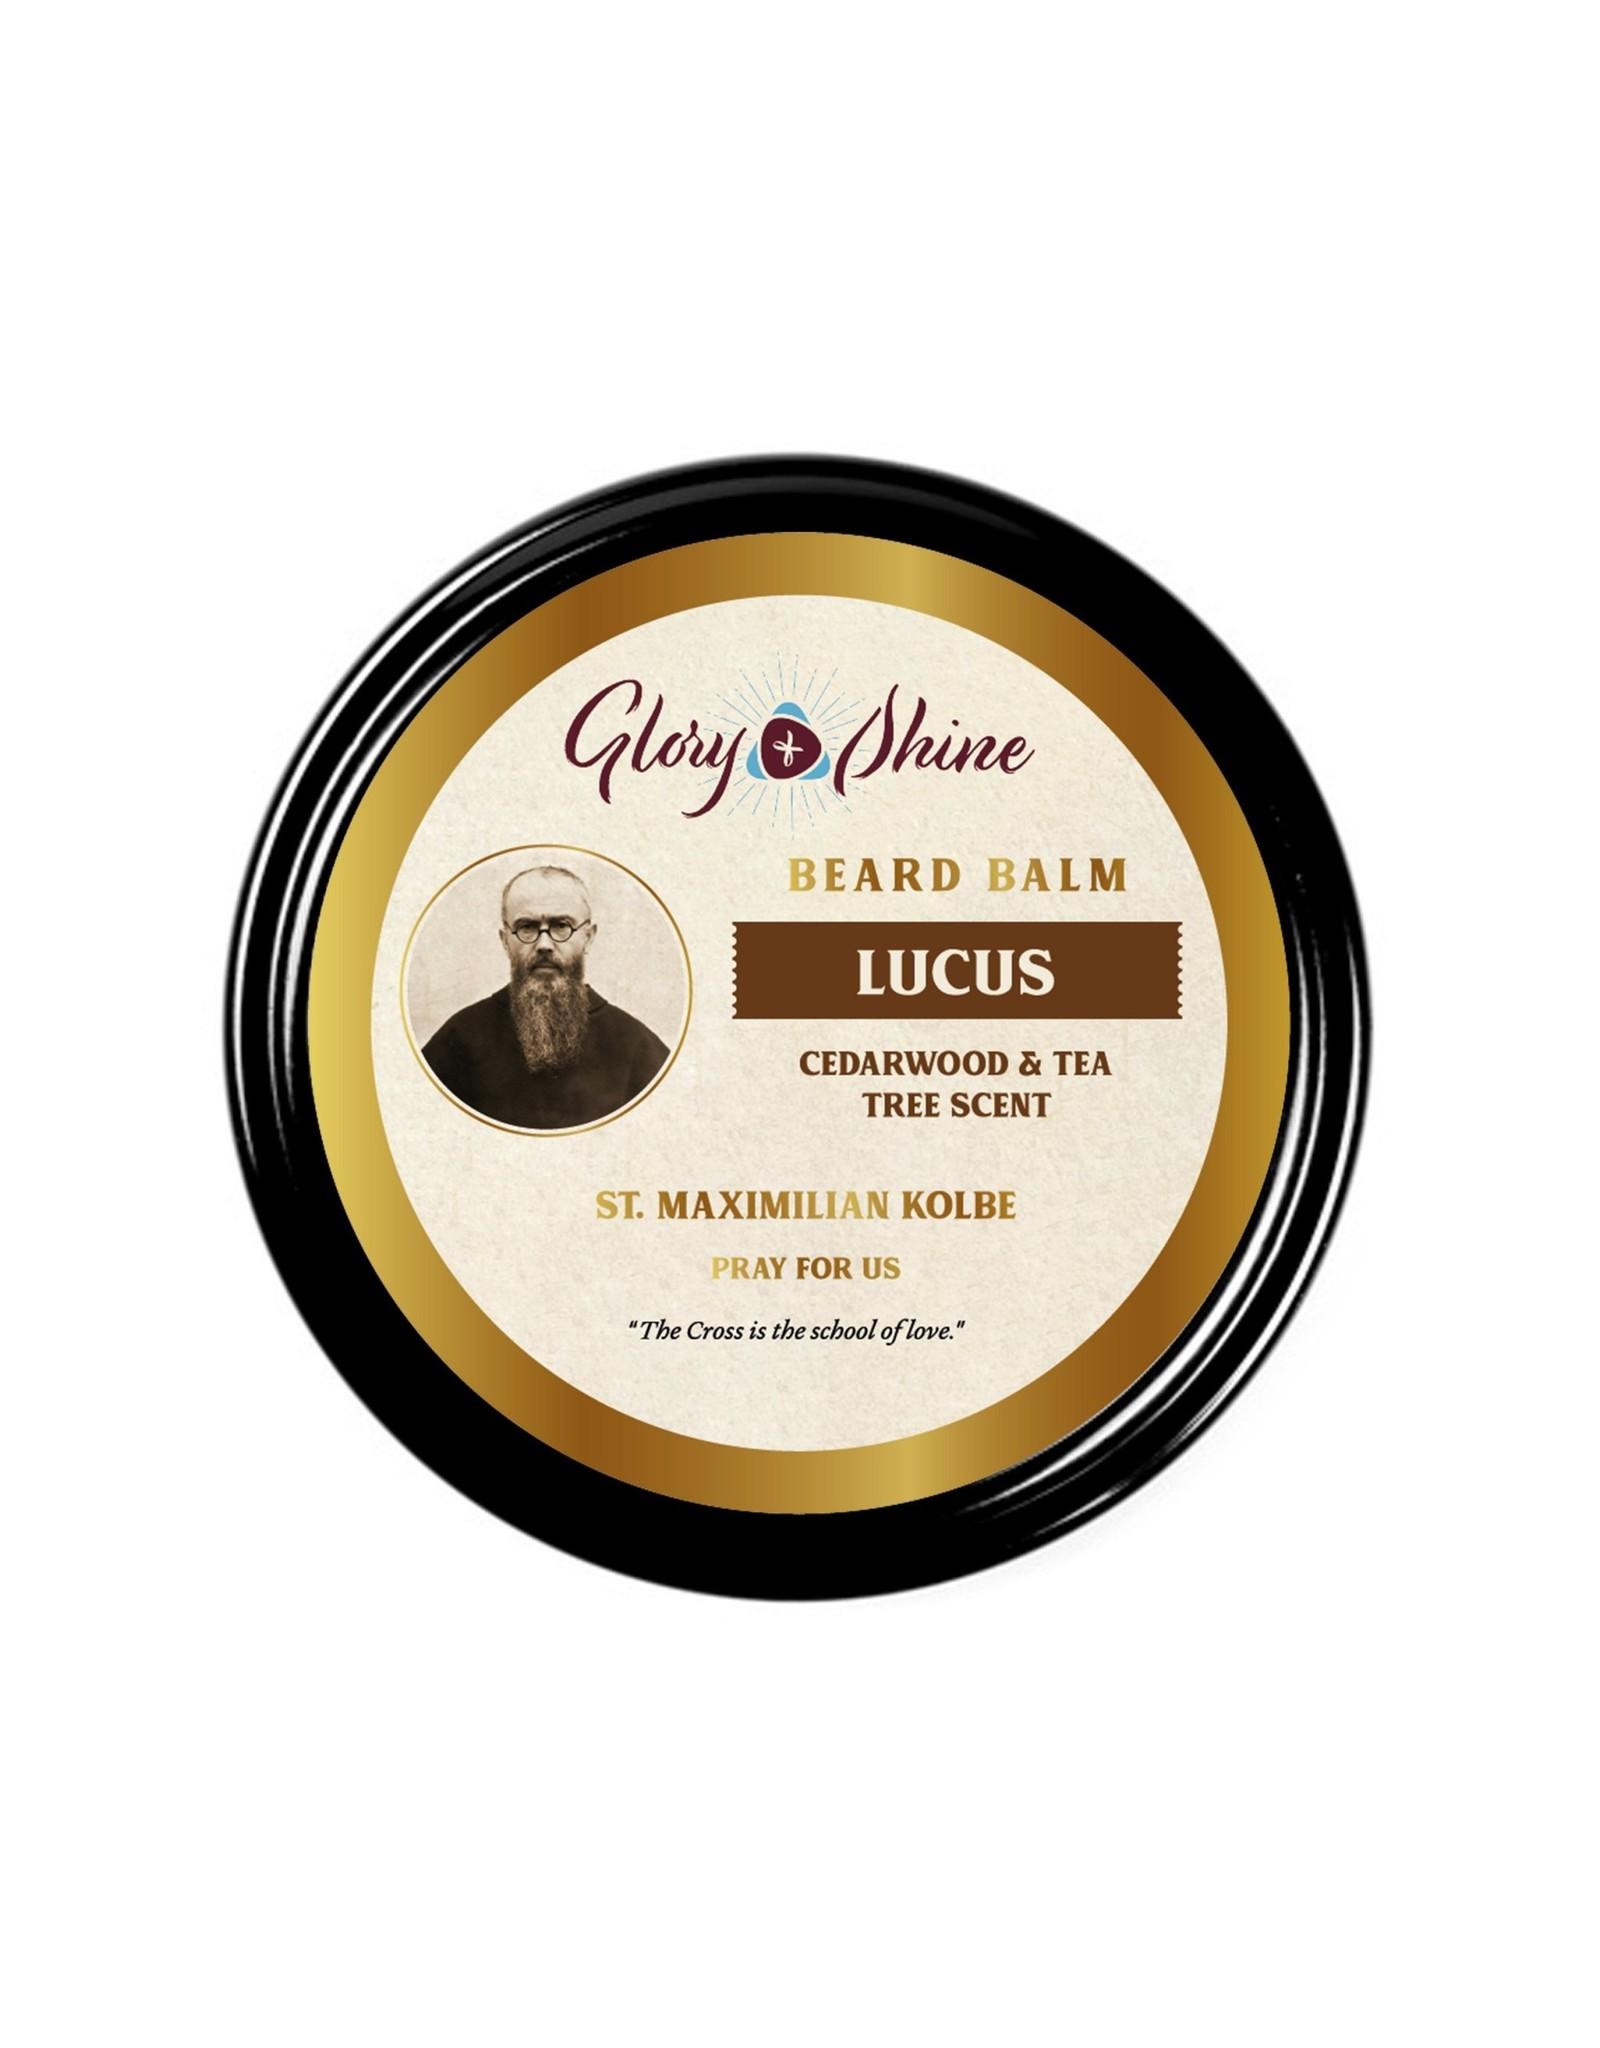 Beard Balm - Lucas (Tea Tree & Cedarwood) - St. Maximilian Kolbe